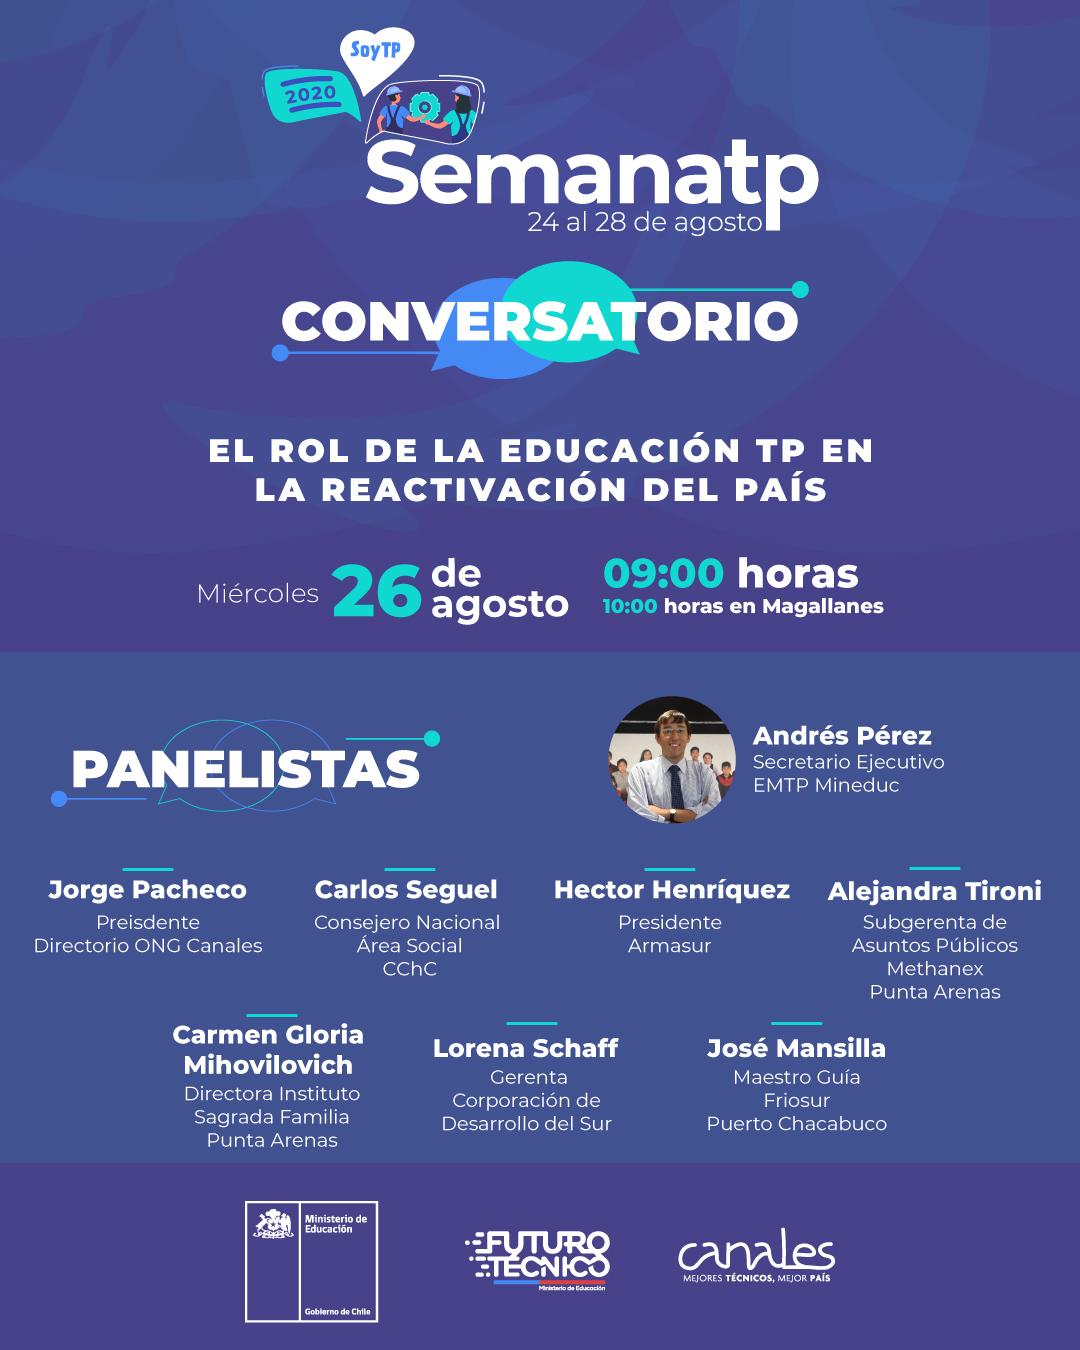 Conversatorio-semanatp(1)